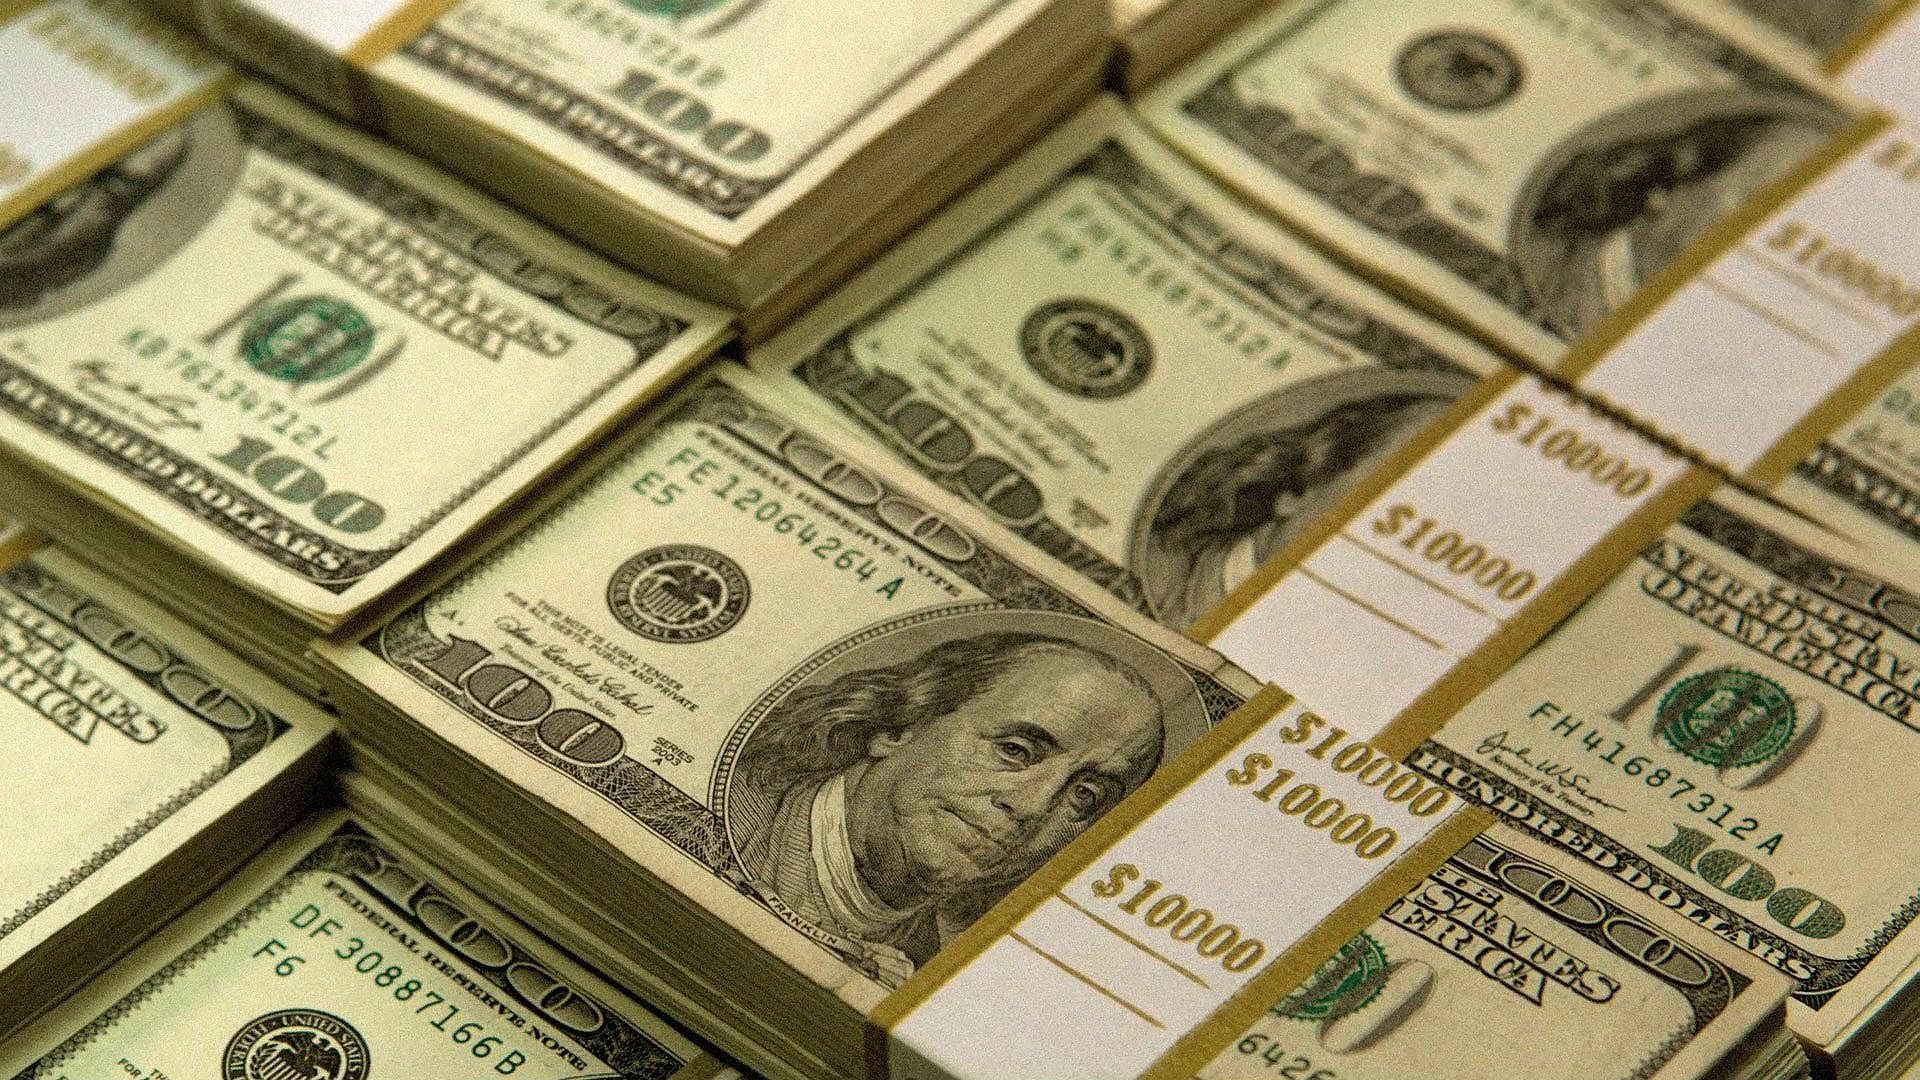 de HD fondo pantalla dinero dólares de bolsas de wallpaper rBFqBwE